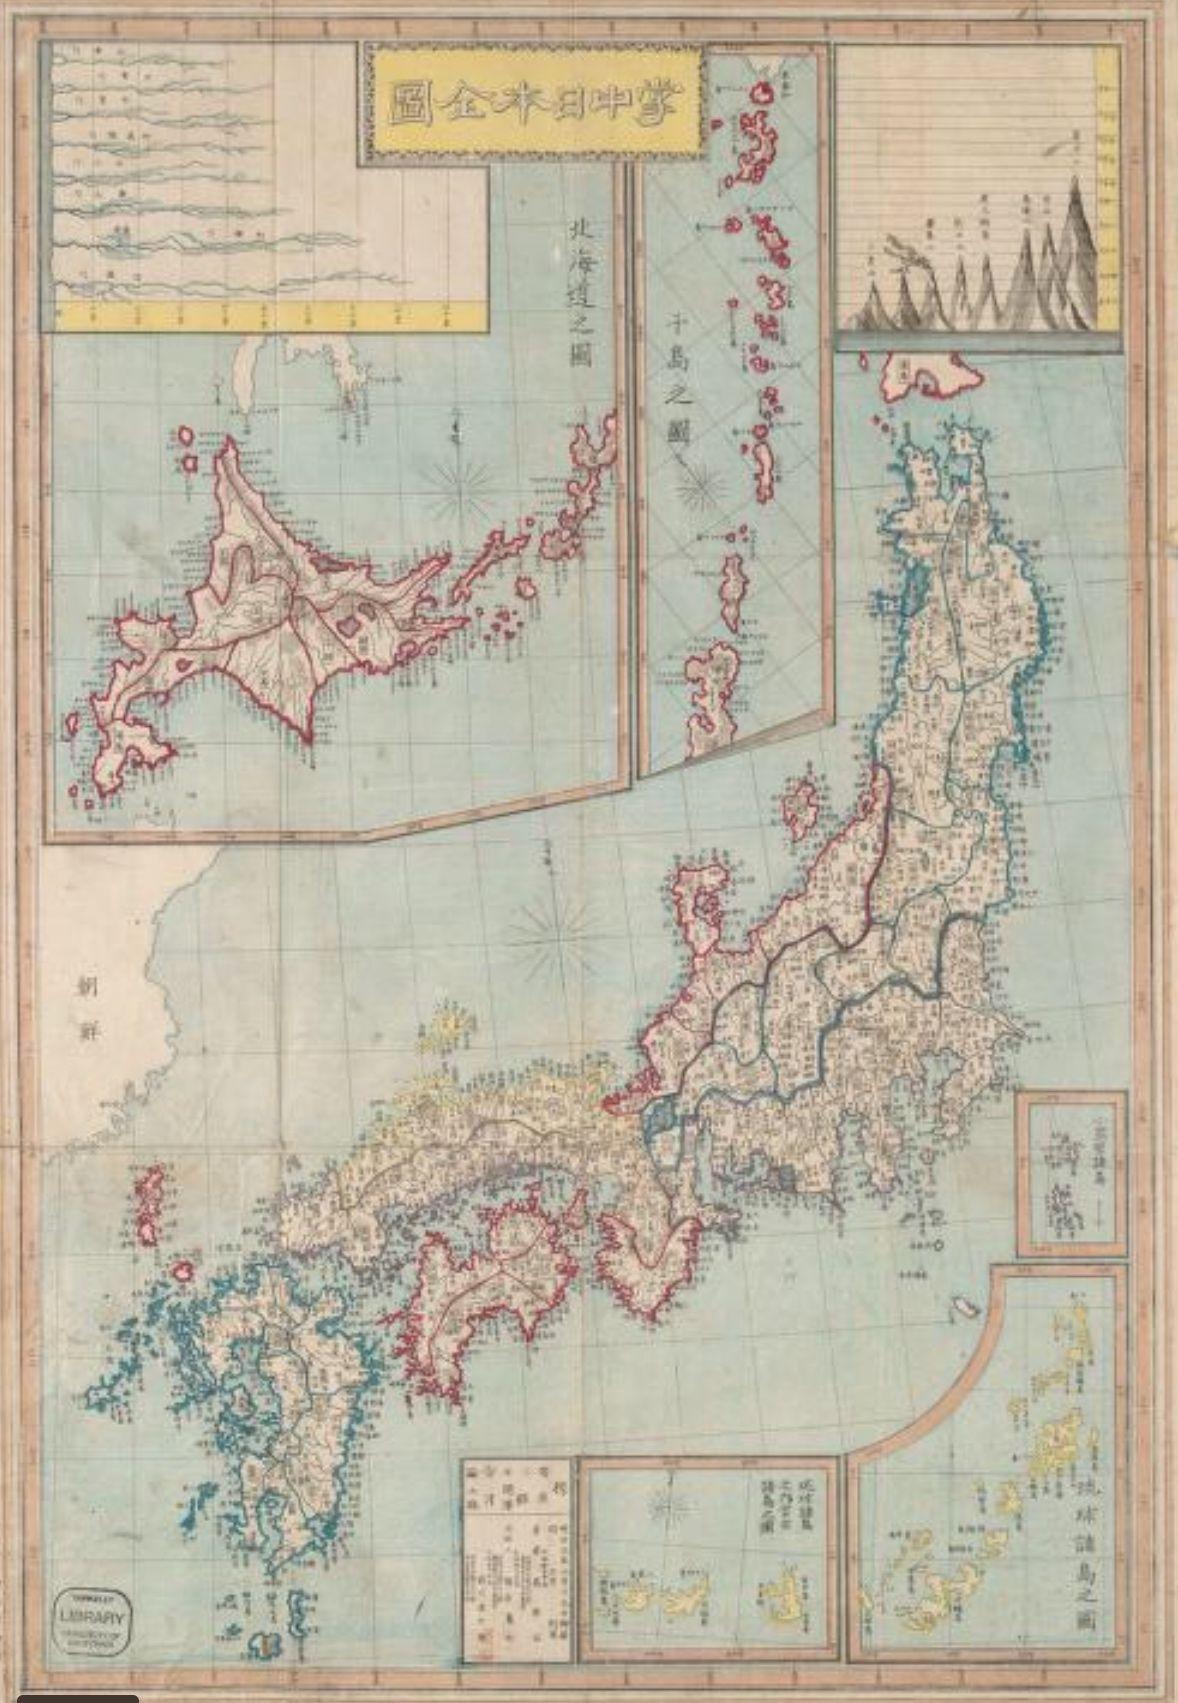 Japanese Map Of Japan Mori Kinseki Shochu Nihon Zenzu - Japan map 9